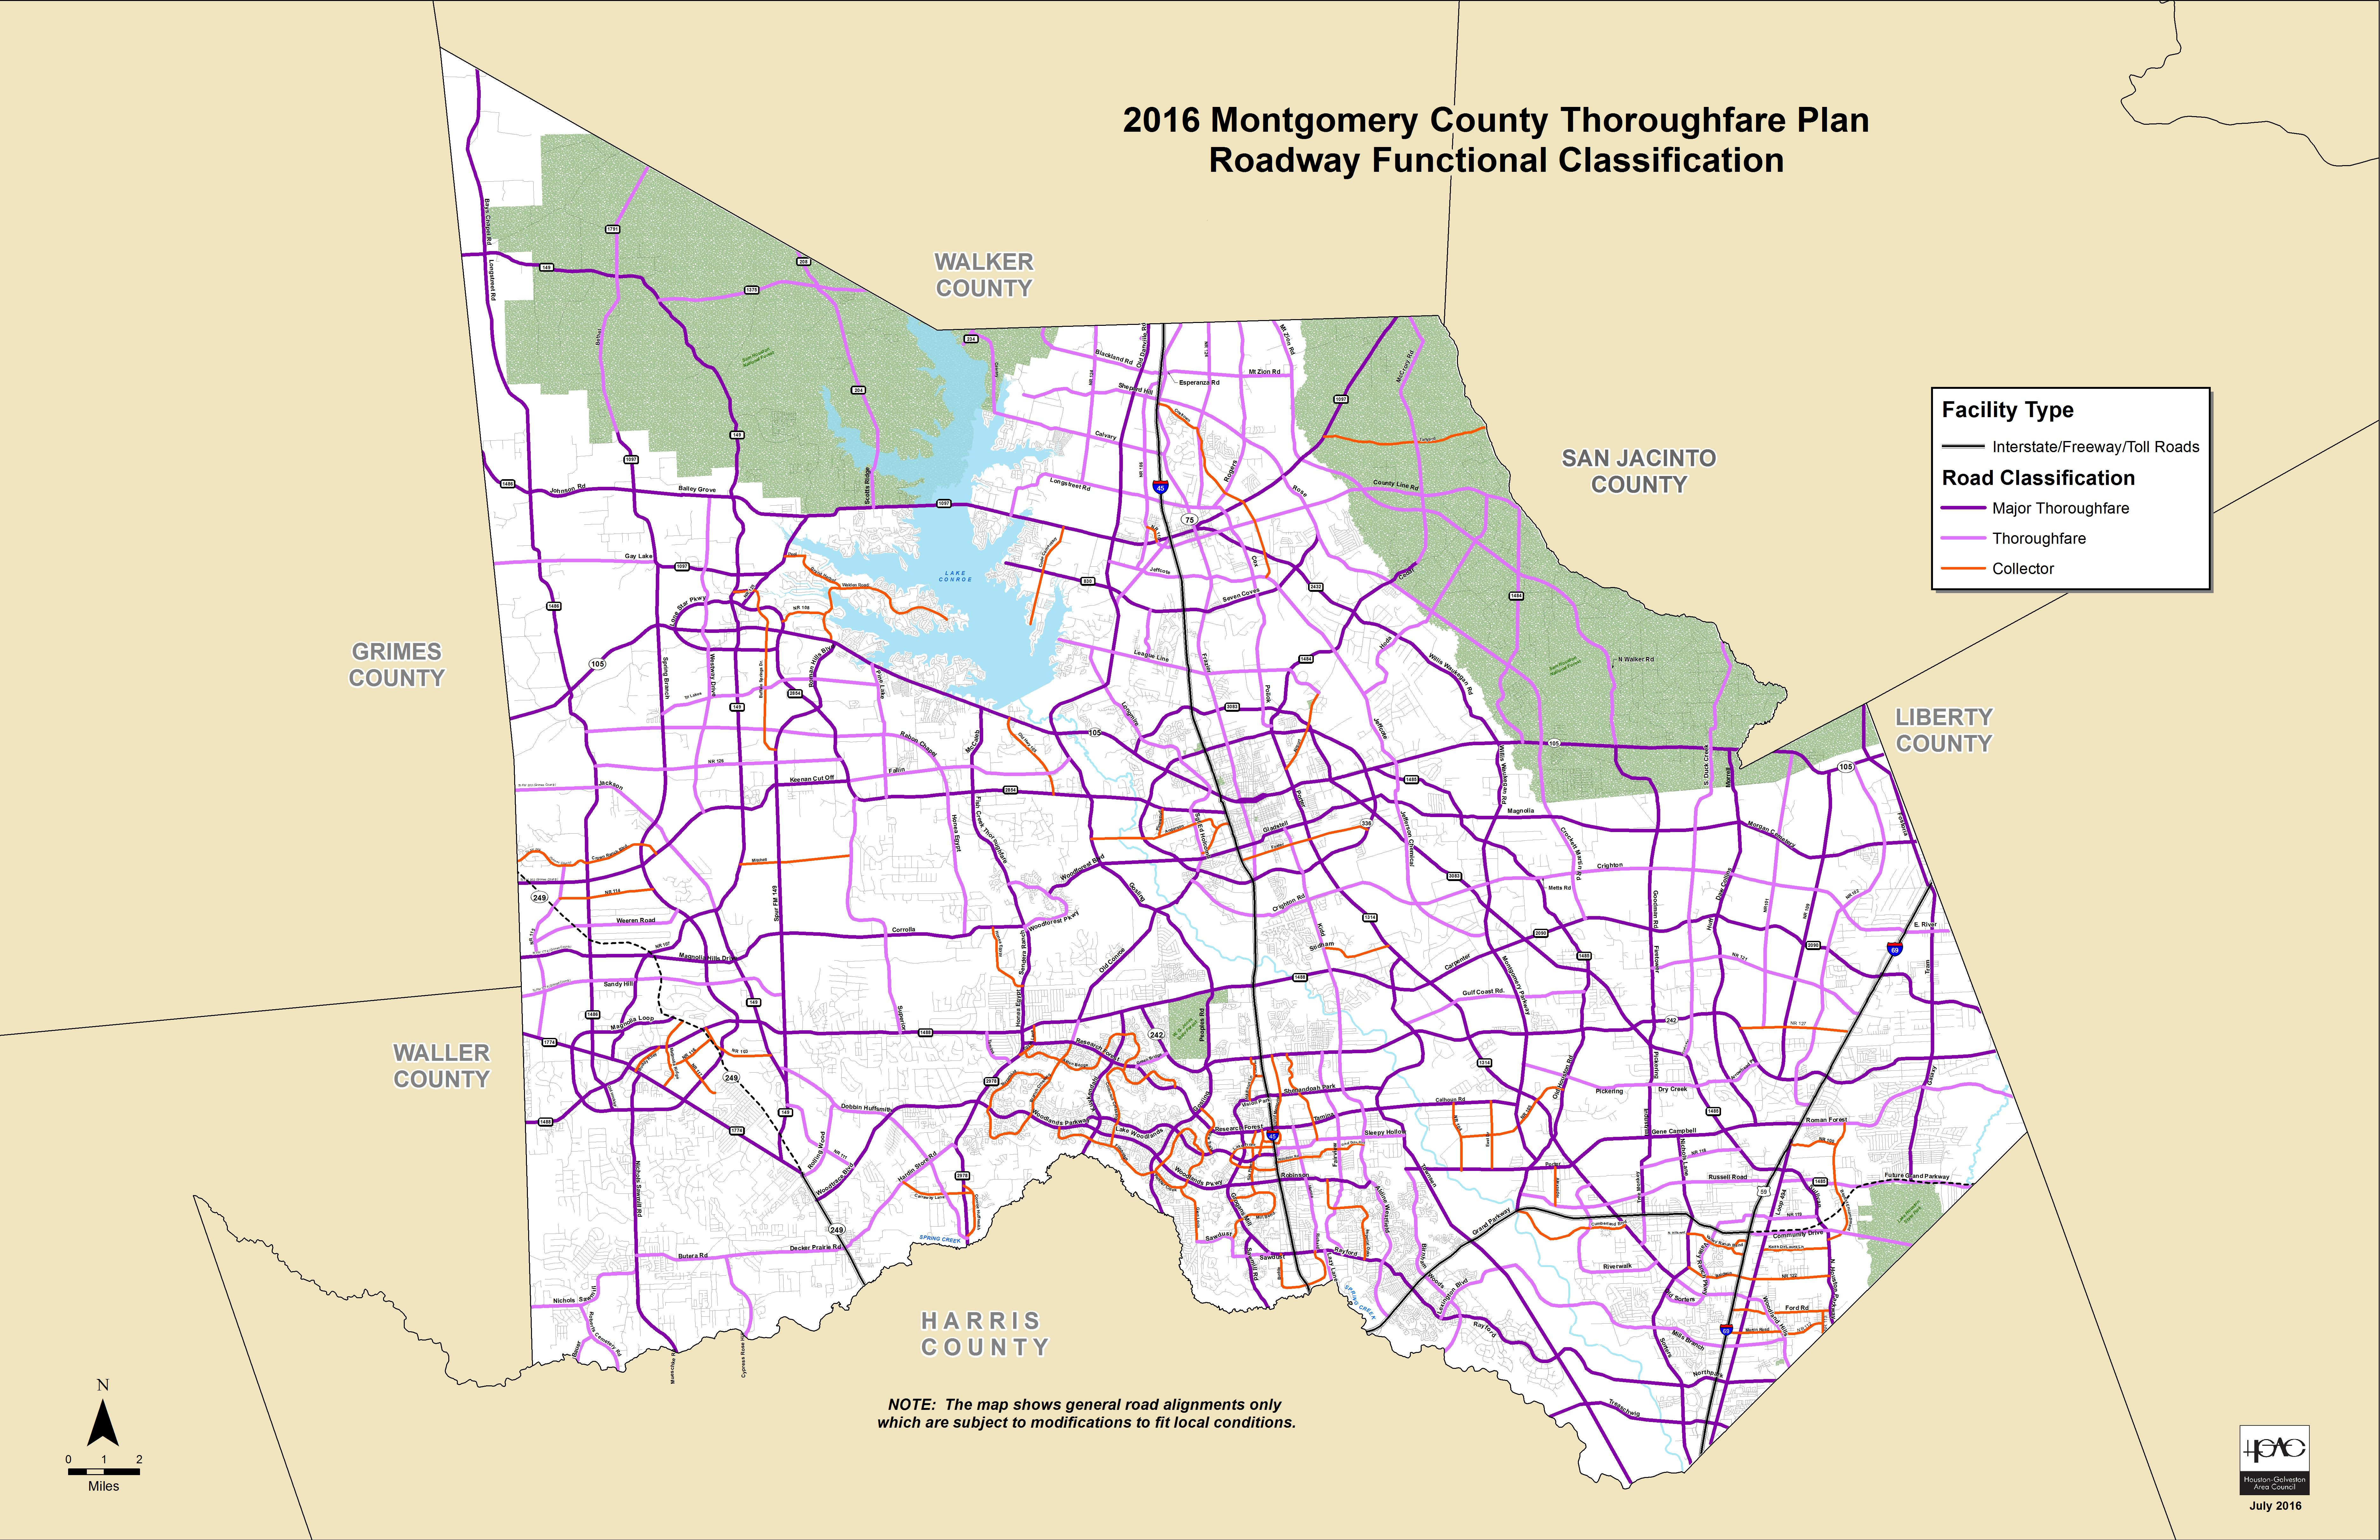 Fema Floodplain Maps Dfirm Federal Emergency Management Agency - Montgomery County Texas Flood Map